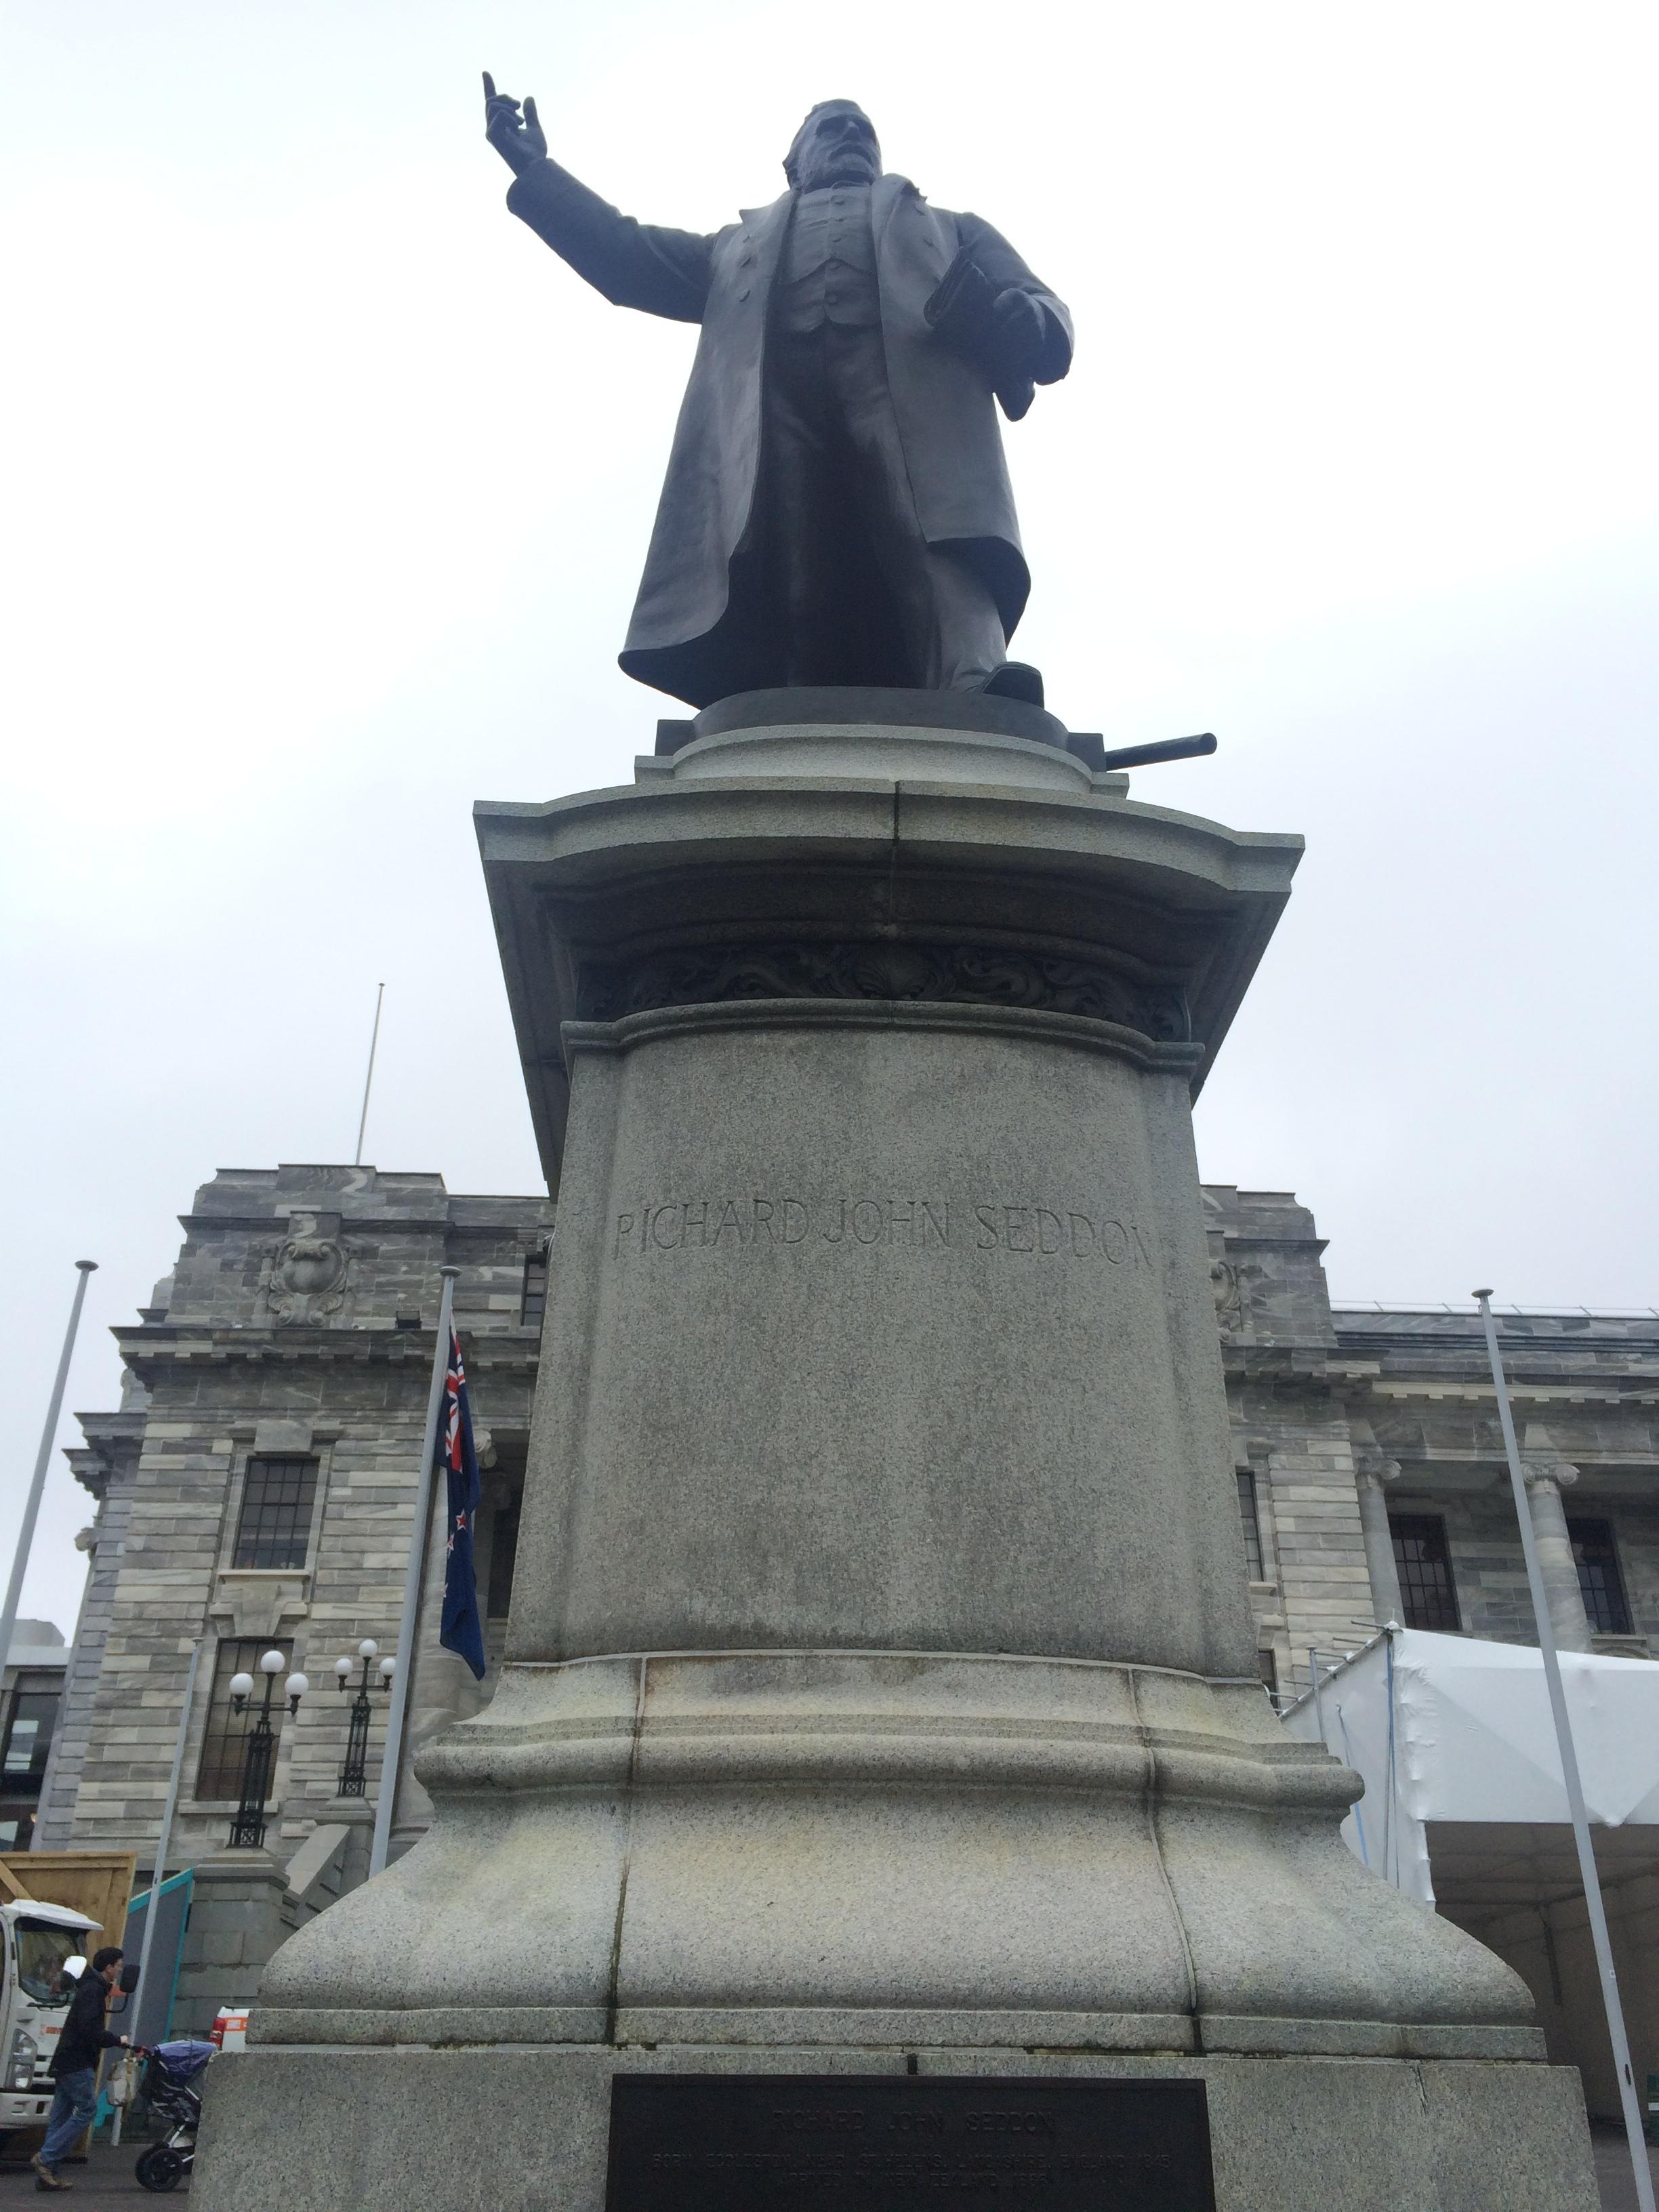 Richard Seddon- Gov. of NZ